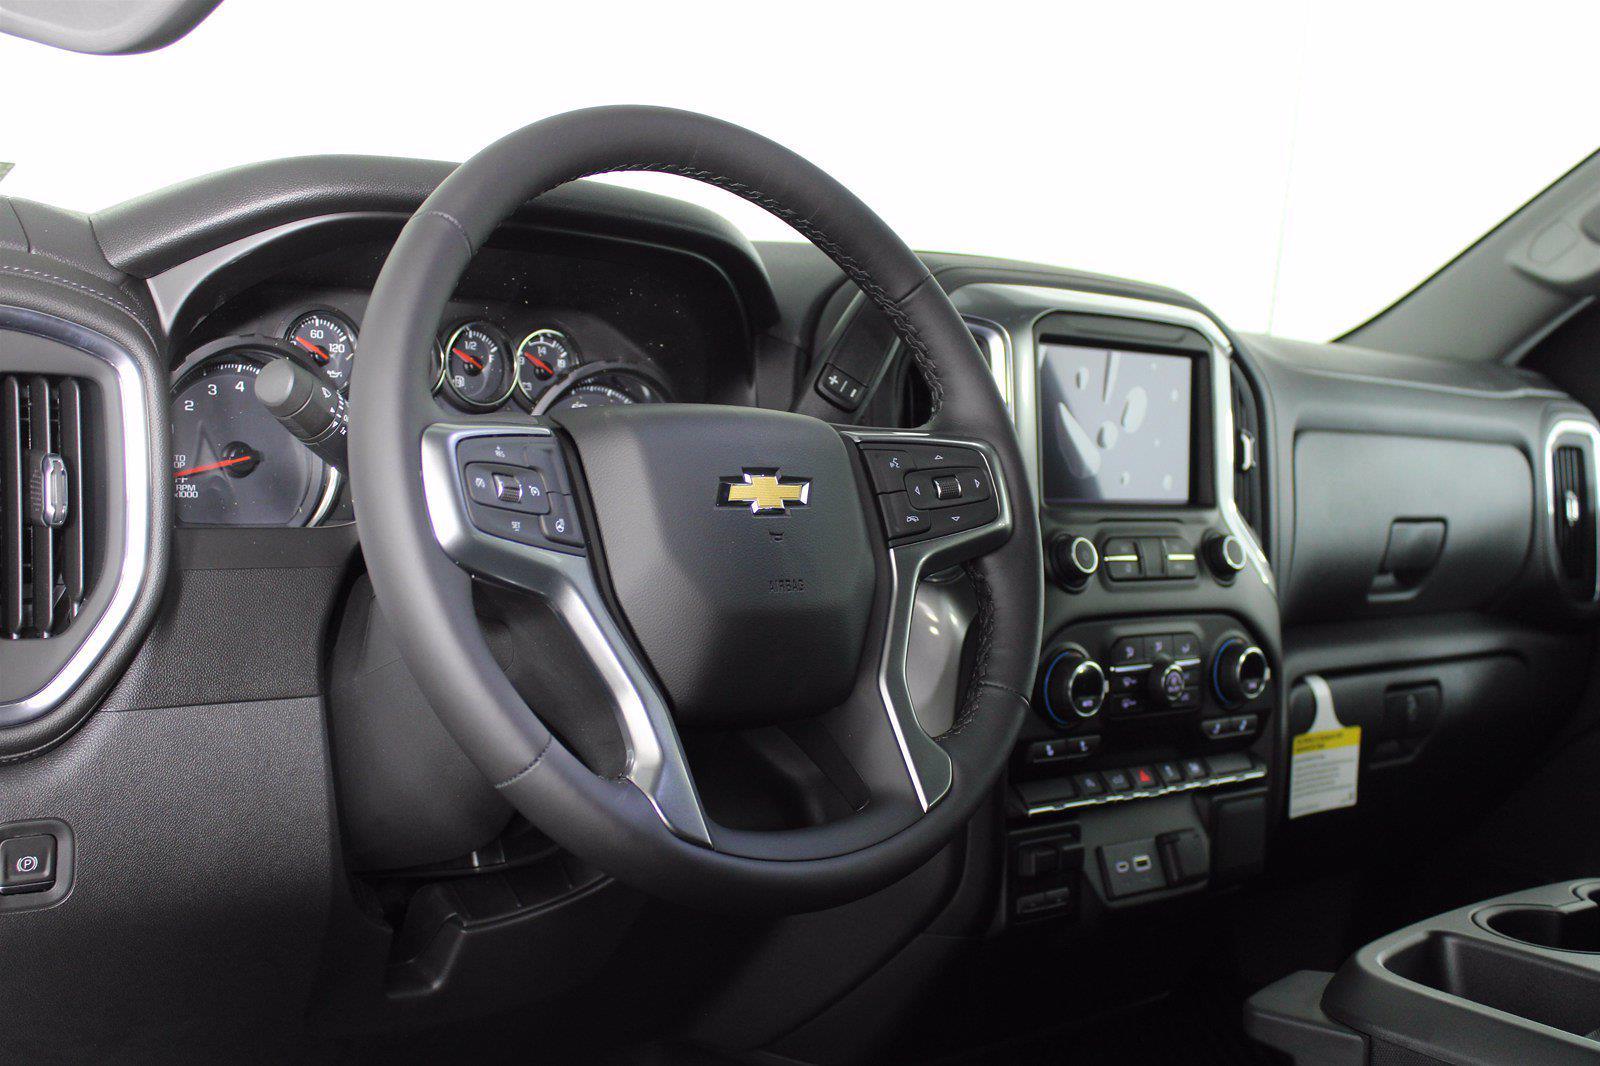 2021 Chevrolet Silverado 1500 Crew Cab 4x4, Pickup #D111136 - photo 10